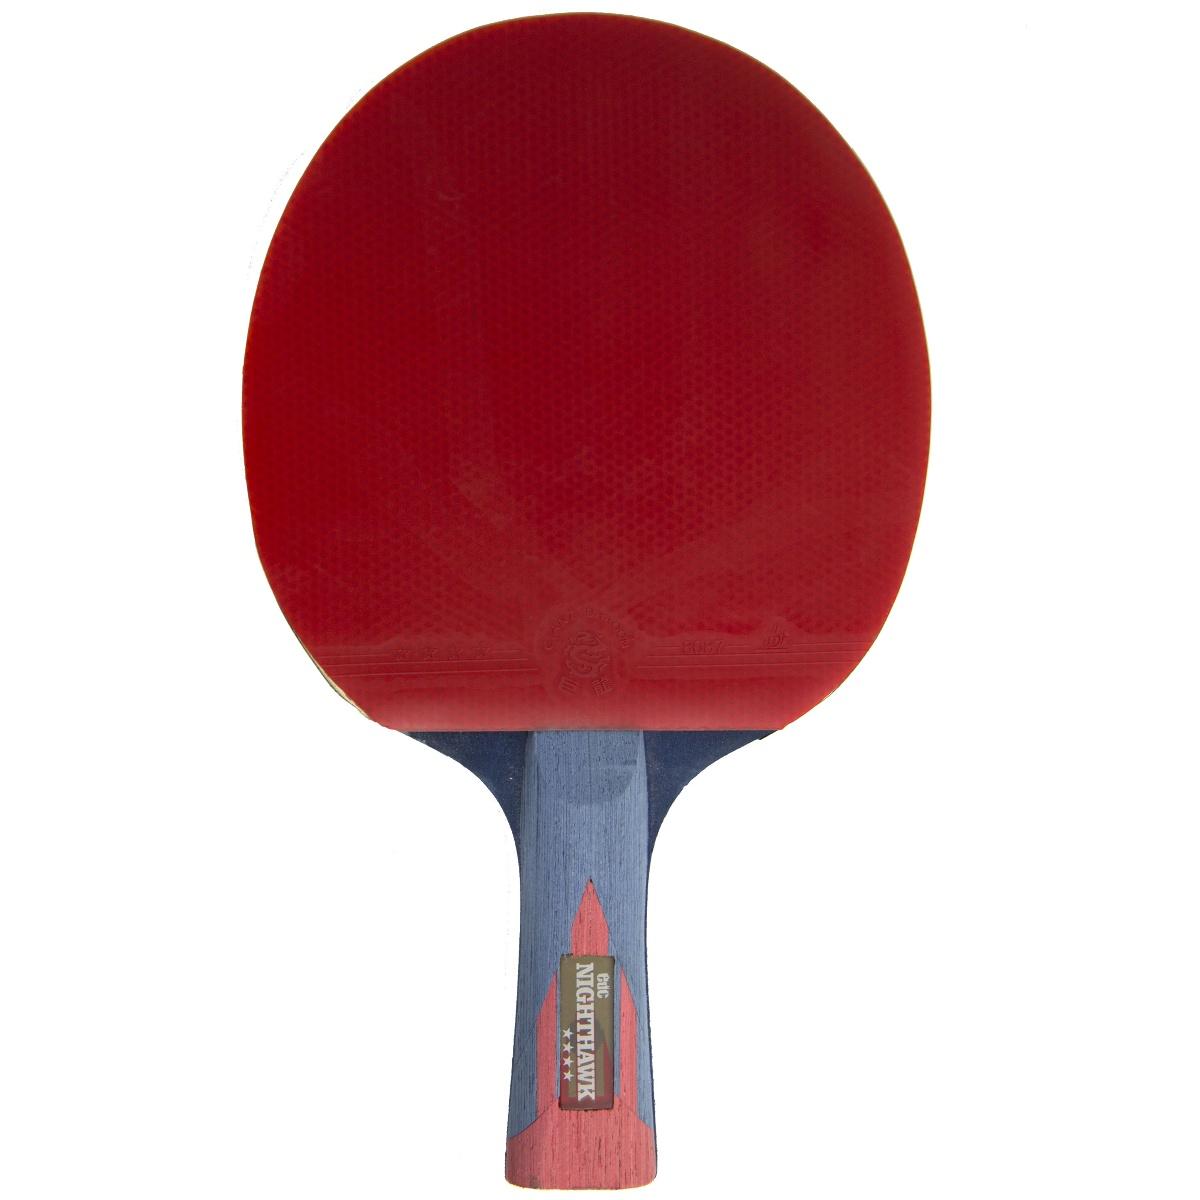 Pálka na stolní tenis DRAGON Nighthawk 4*